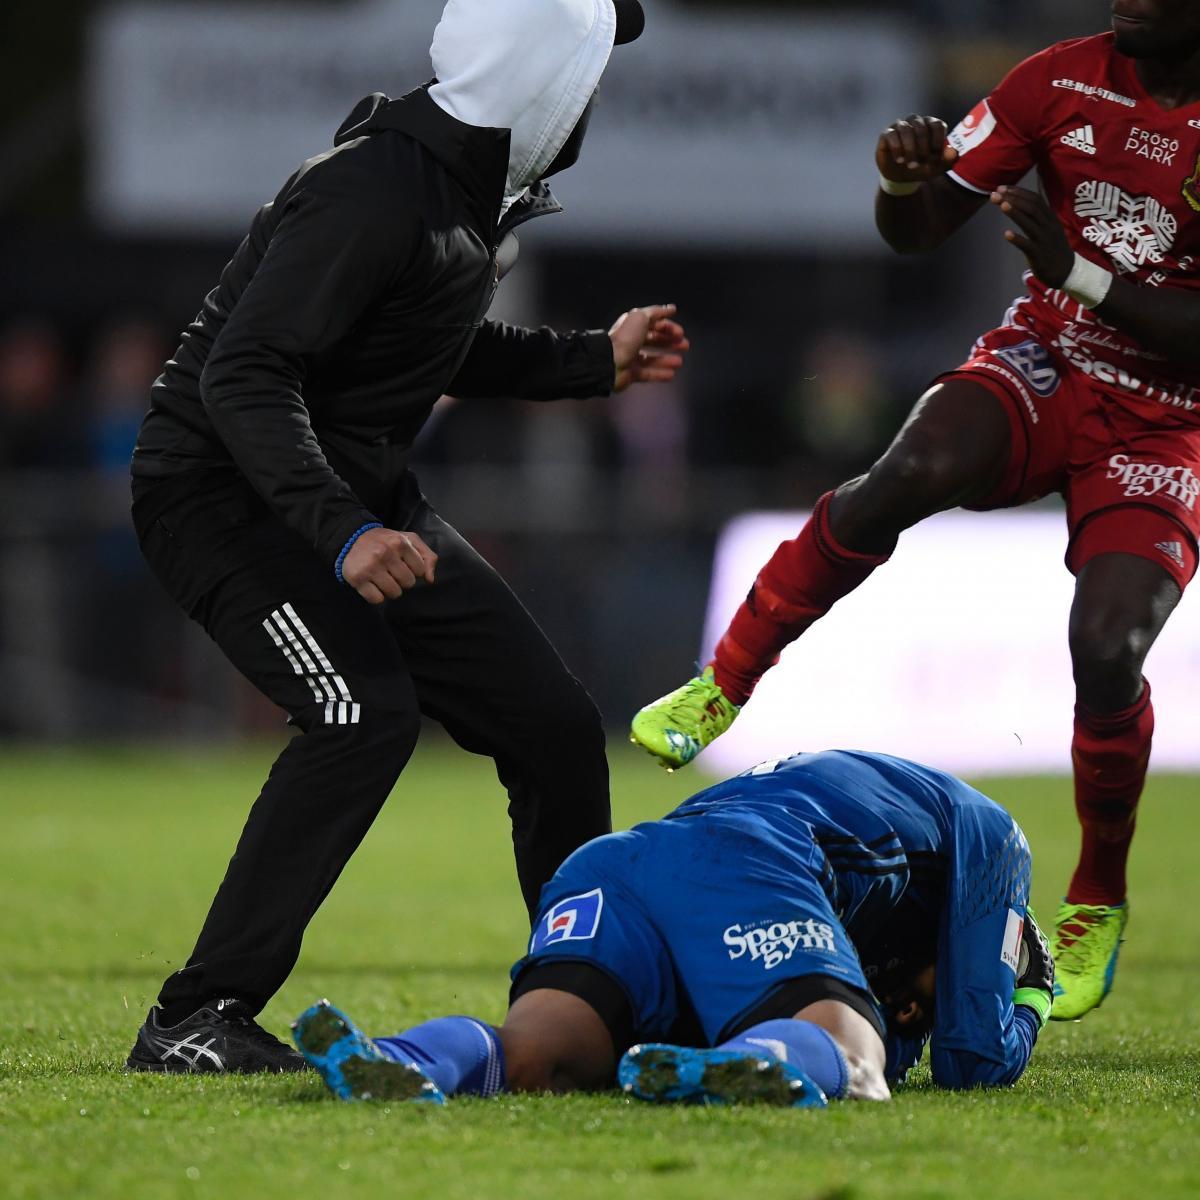 Swedish Allsvenskan Match Abandoned After Fan Attacks GK, Makes Bomb Threat